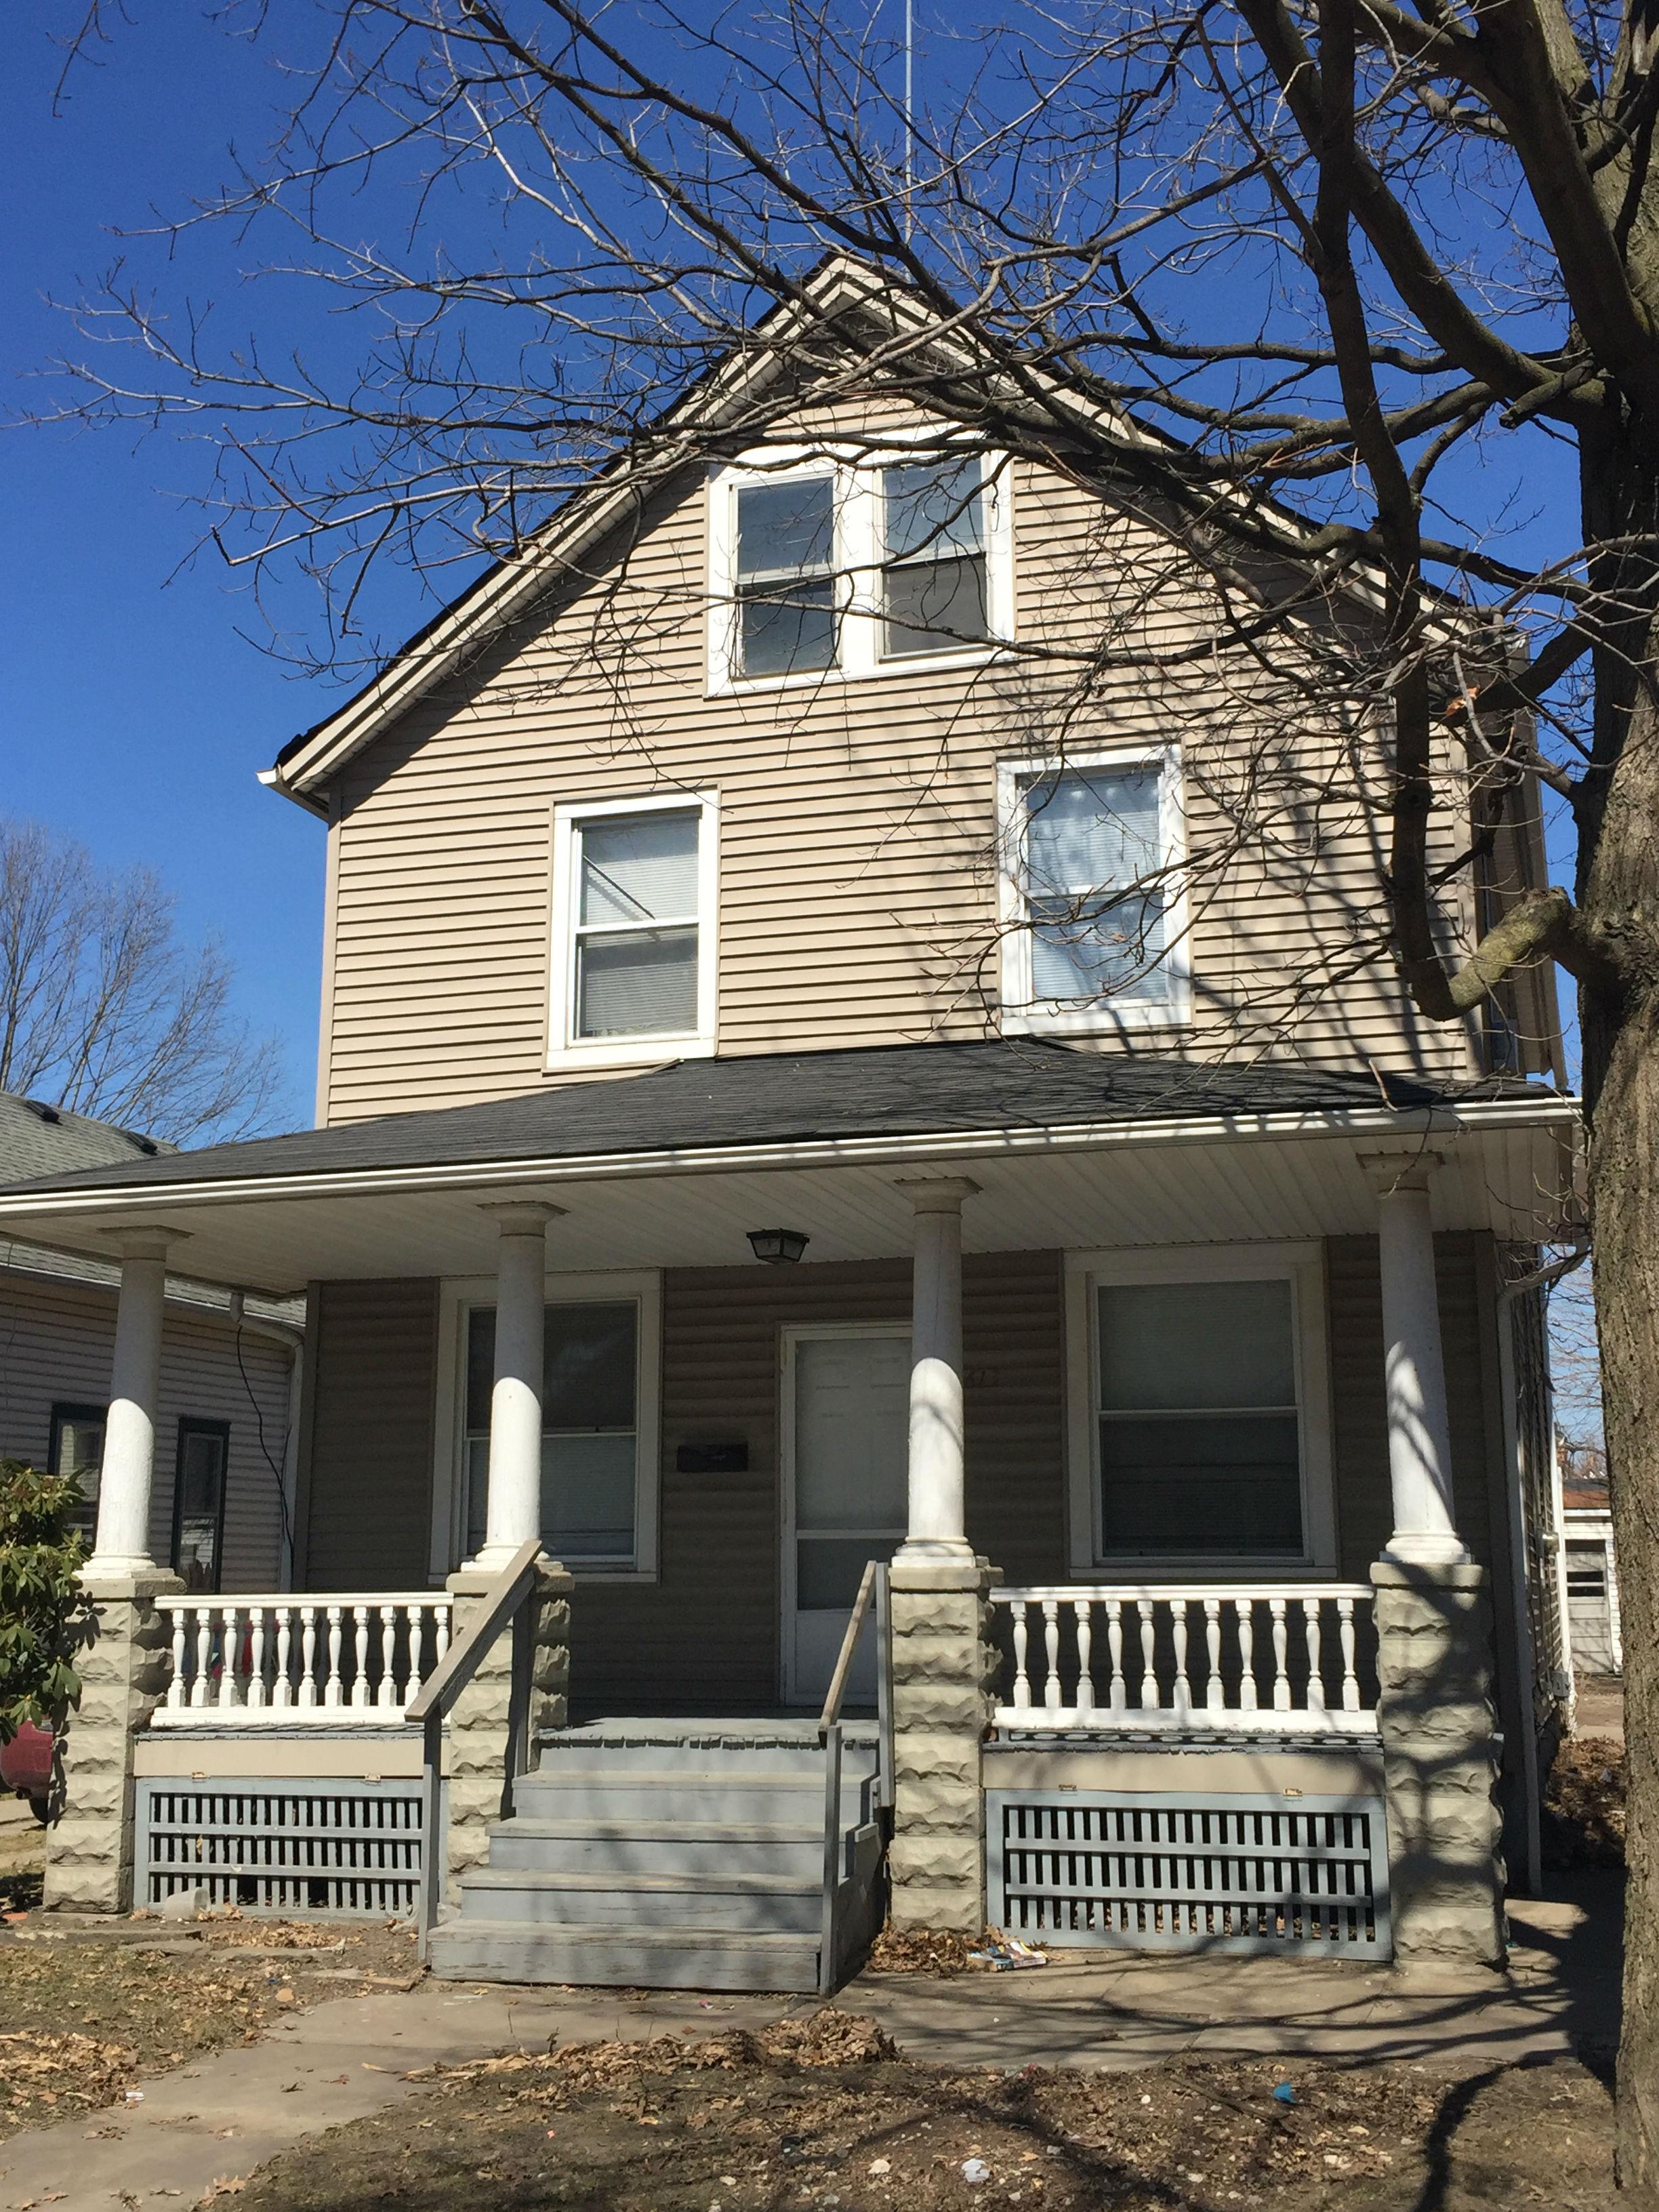 6613 Gertrude Ave., Cleveland | 5 bed 2 bath | 1,584 Sq. Ft. | $40,600